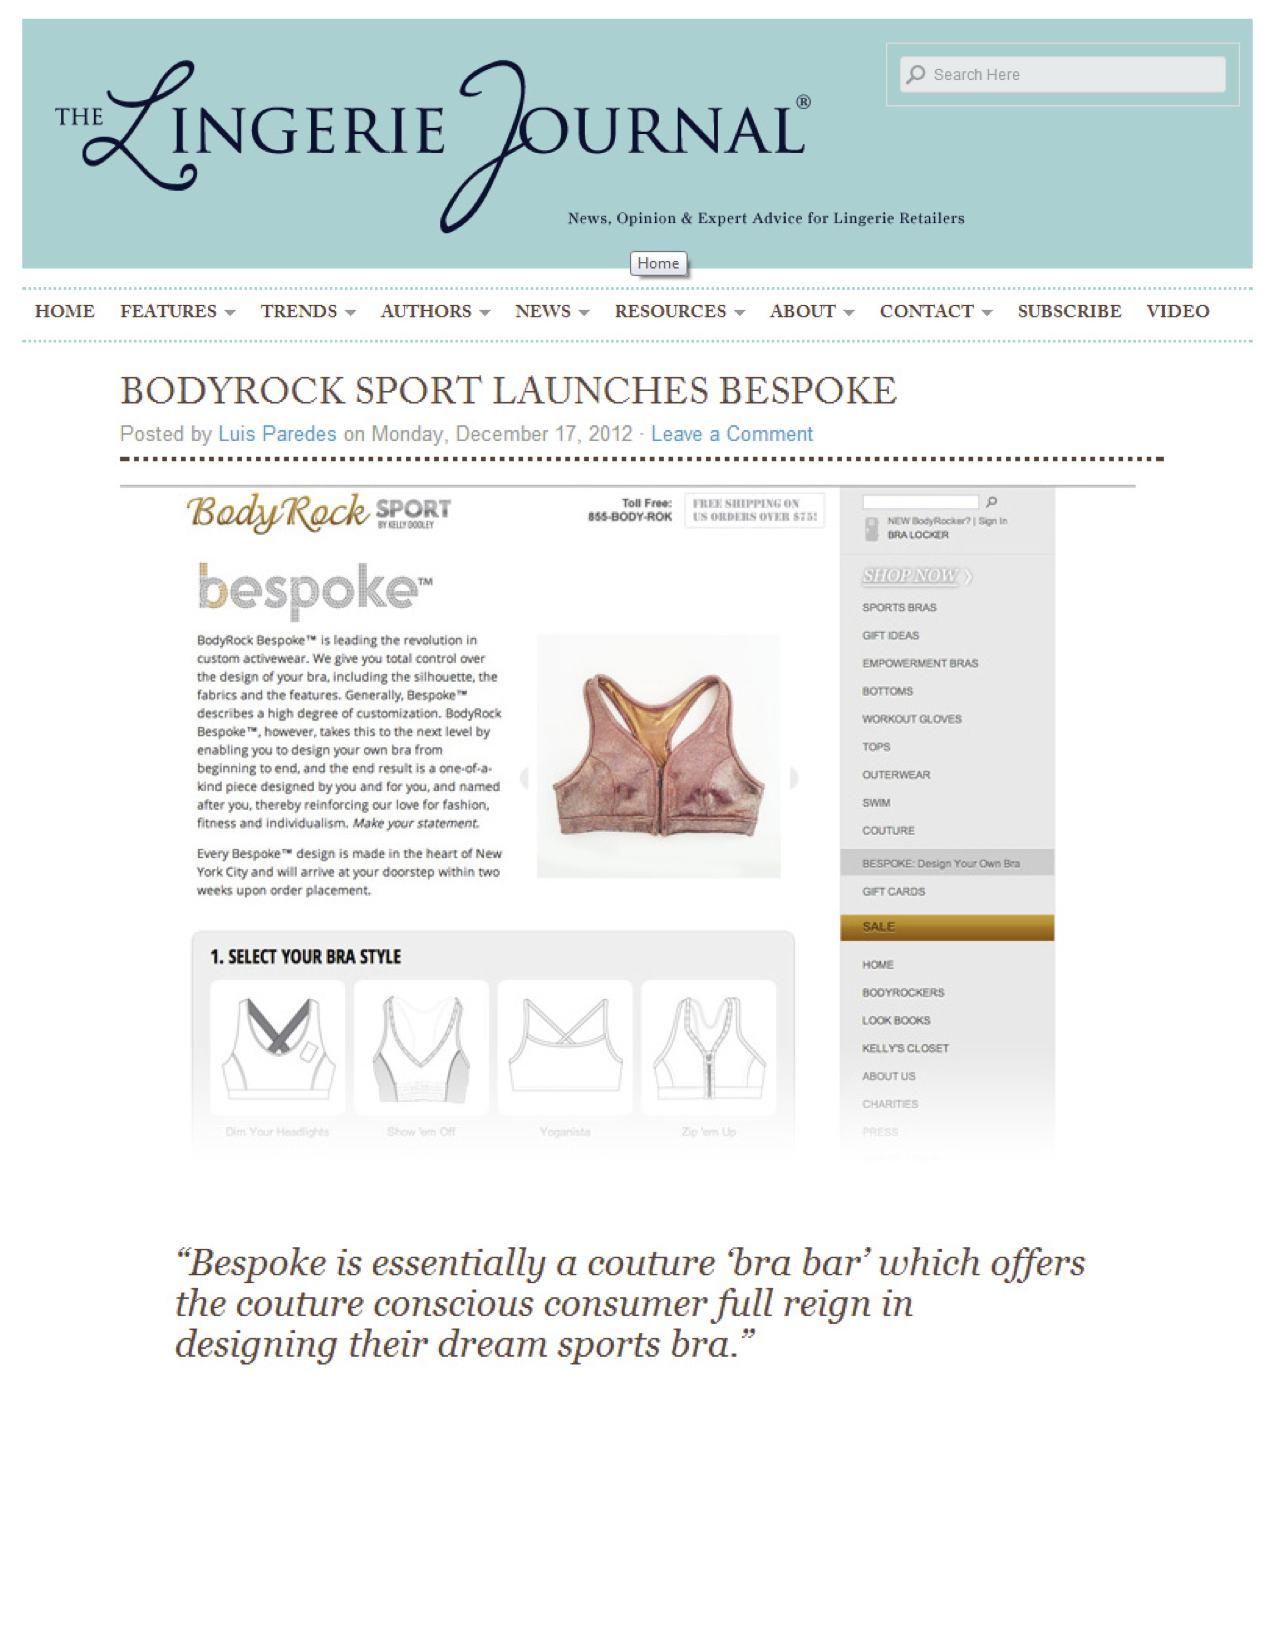 The Lingerie Journal-BodyRock Page 1.jpg